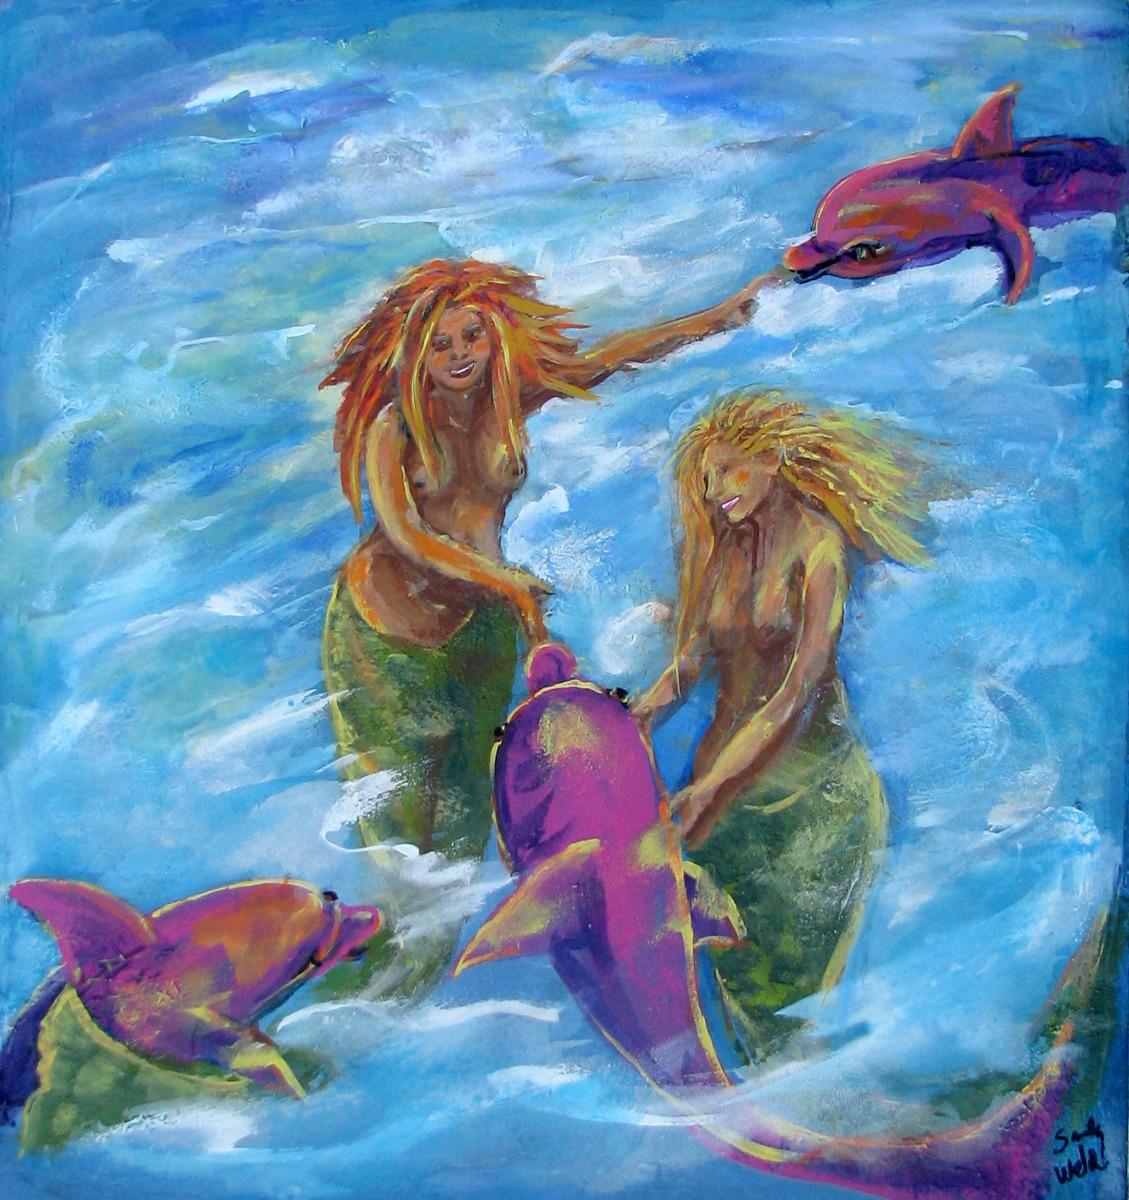 Sandy Weld's acrylic paining of Mermaids nurturing pink dolphins in blue ocean scene.  (large view)